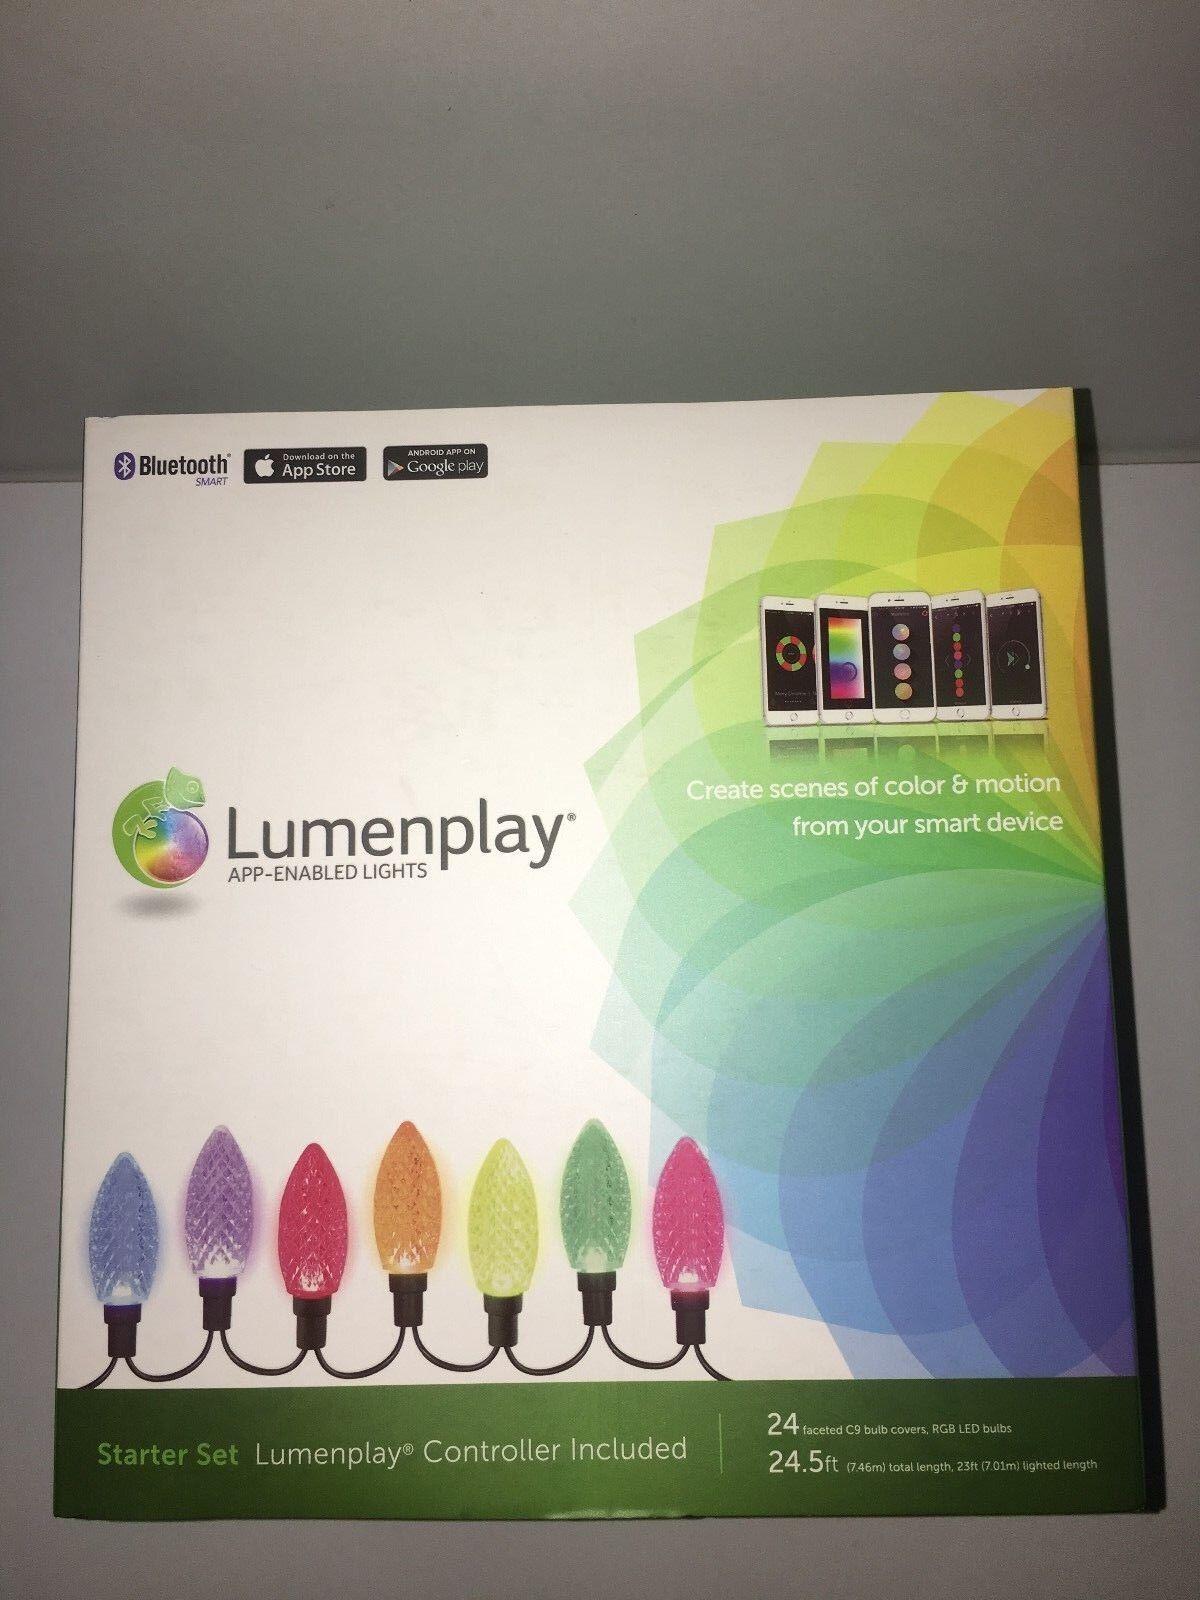 NEW LUMENPLAY APP ENABLED C9 LED HOLIDAY CHRISTMAS LIGHTS STARTER SET blueETOOTH